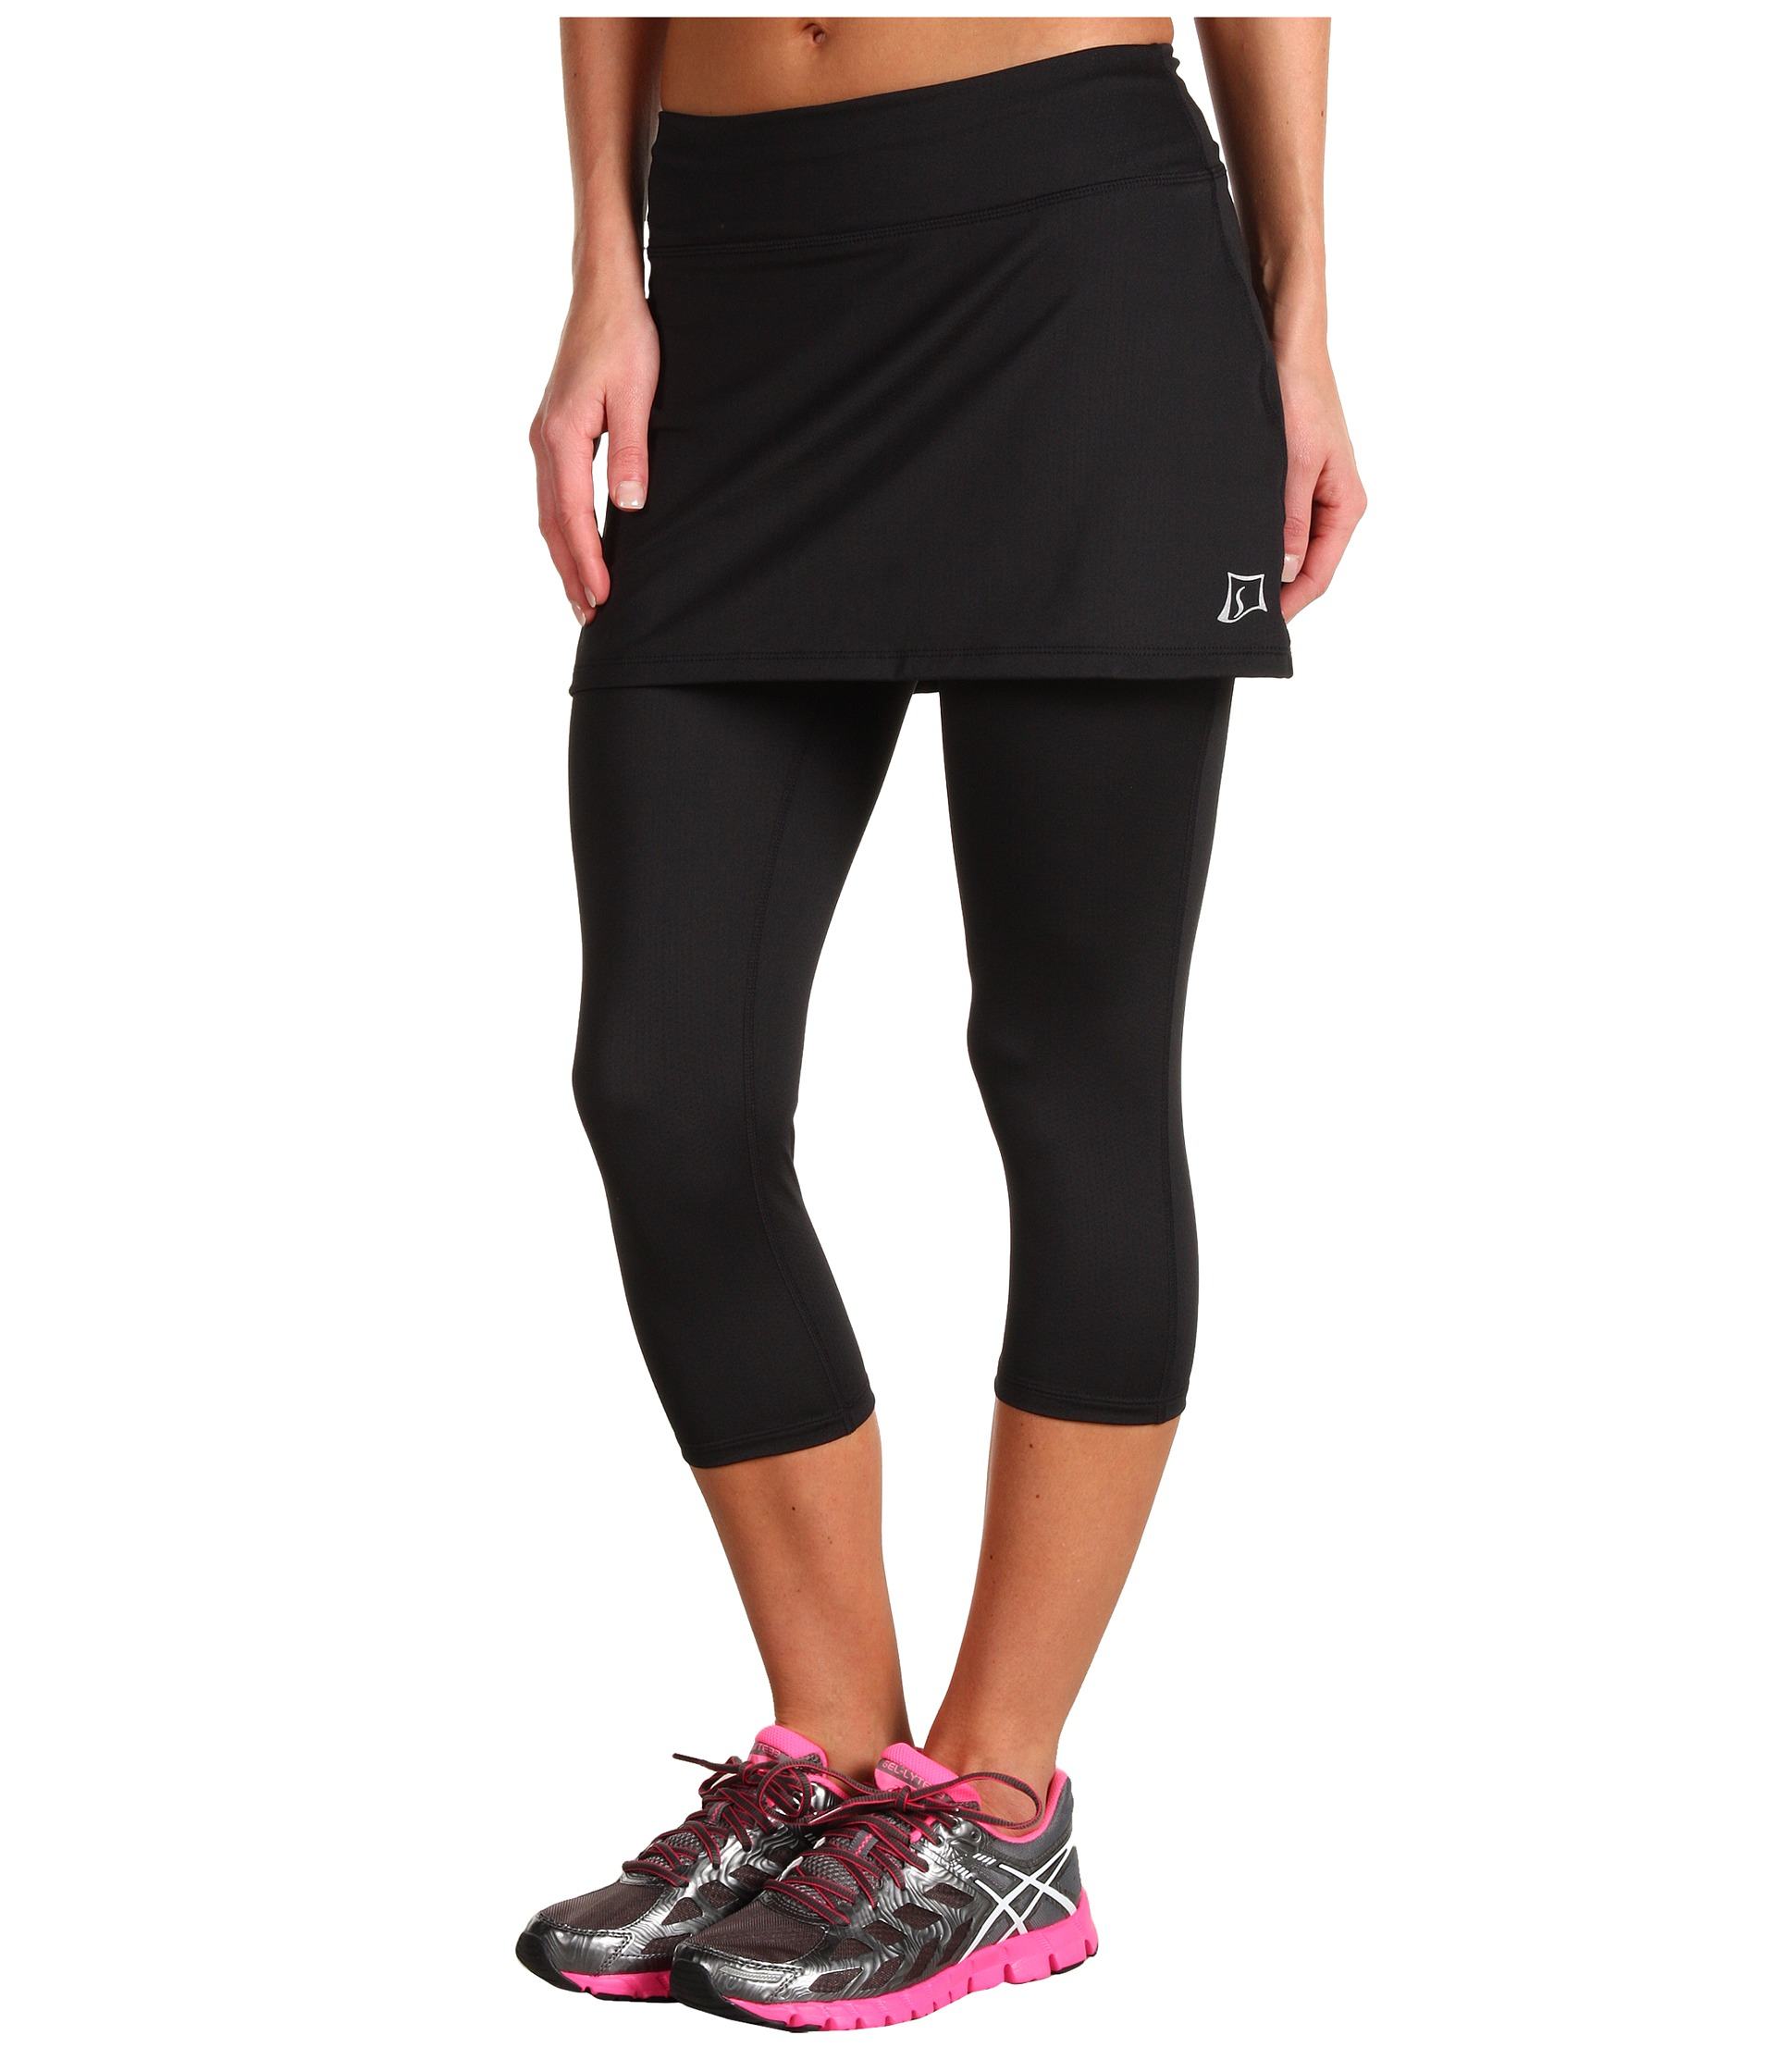 Skirt Sports Lotta Breeze Capri - Zappos.com Free Shipping BOTH Ways